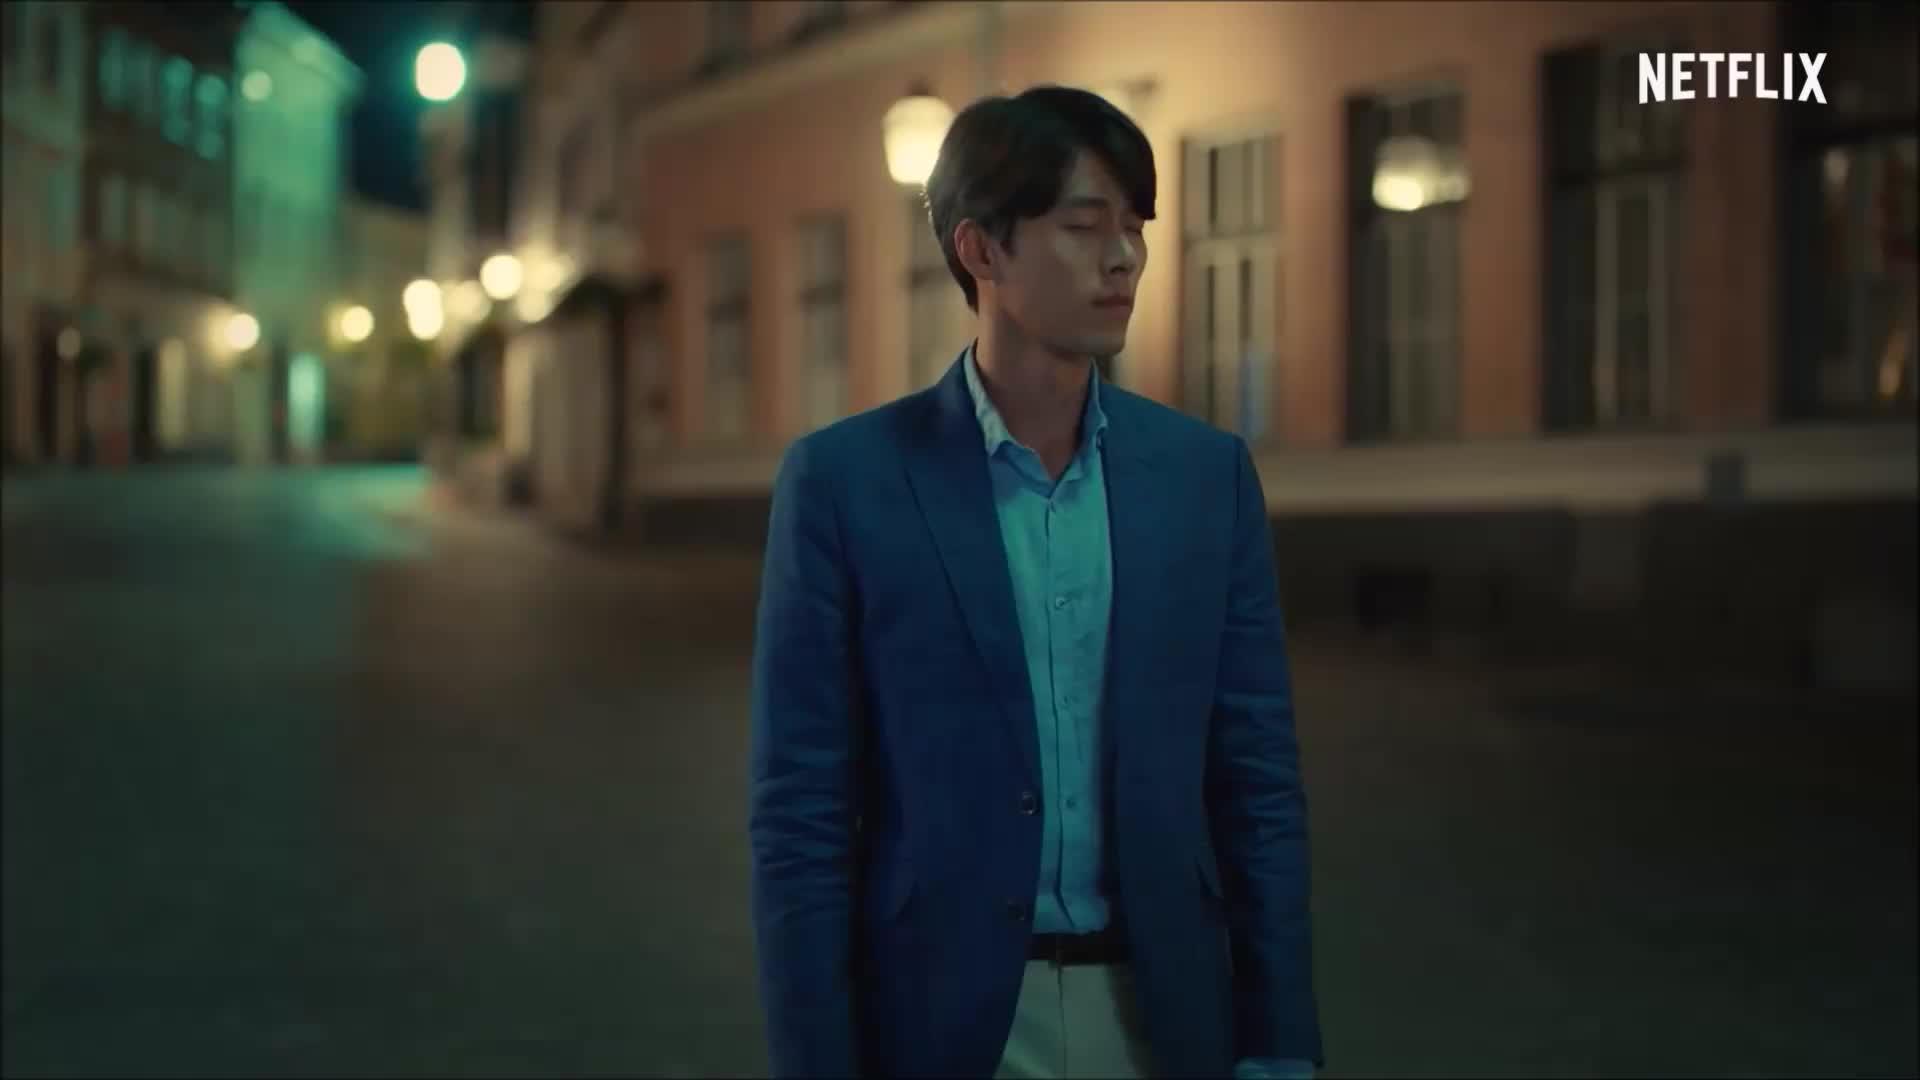 Alhambeura Goongjeonui Chooeok Tv Series 2018 2019 Imdb